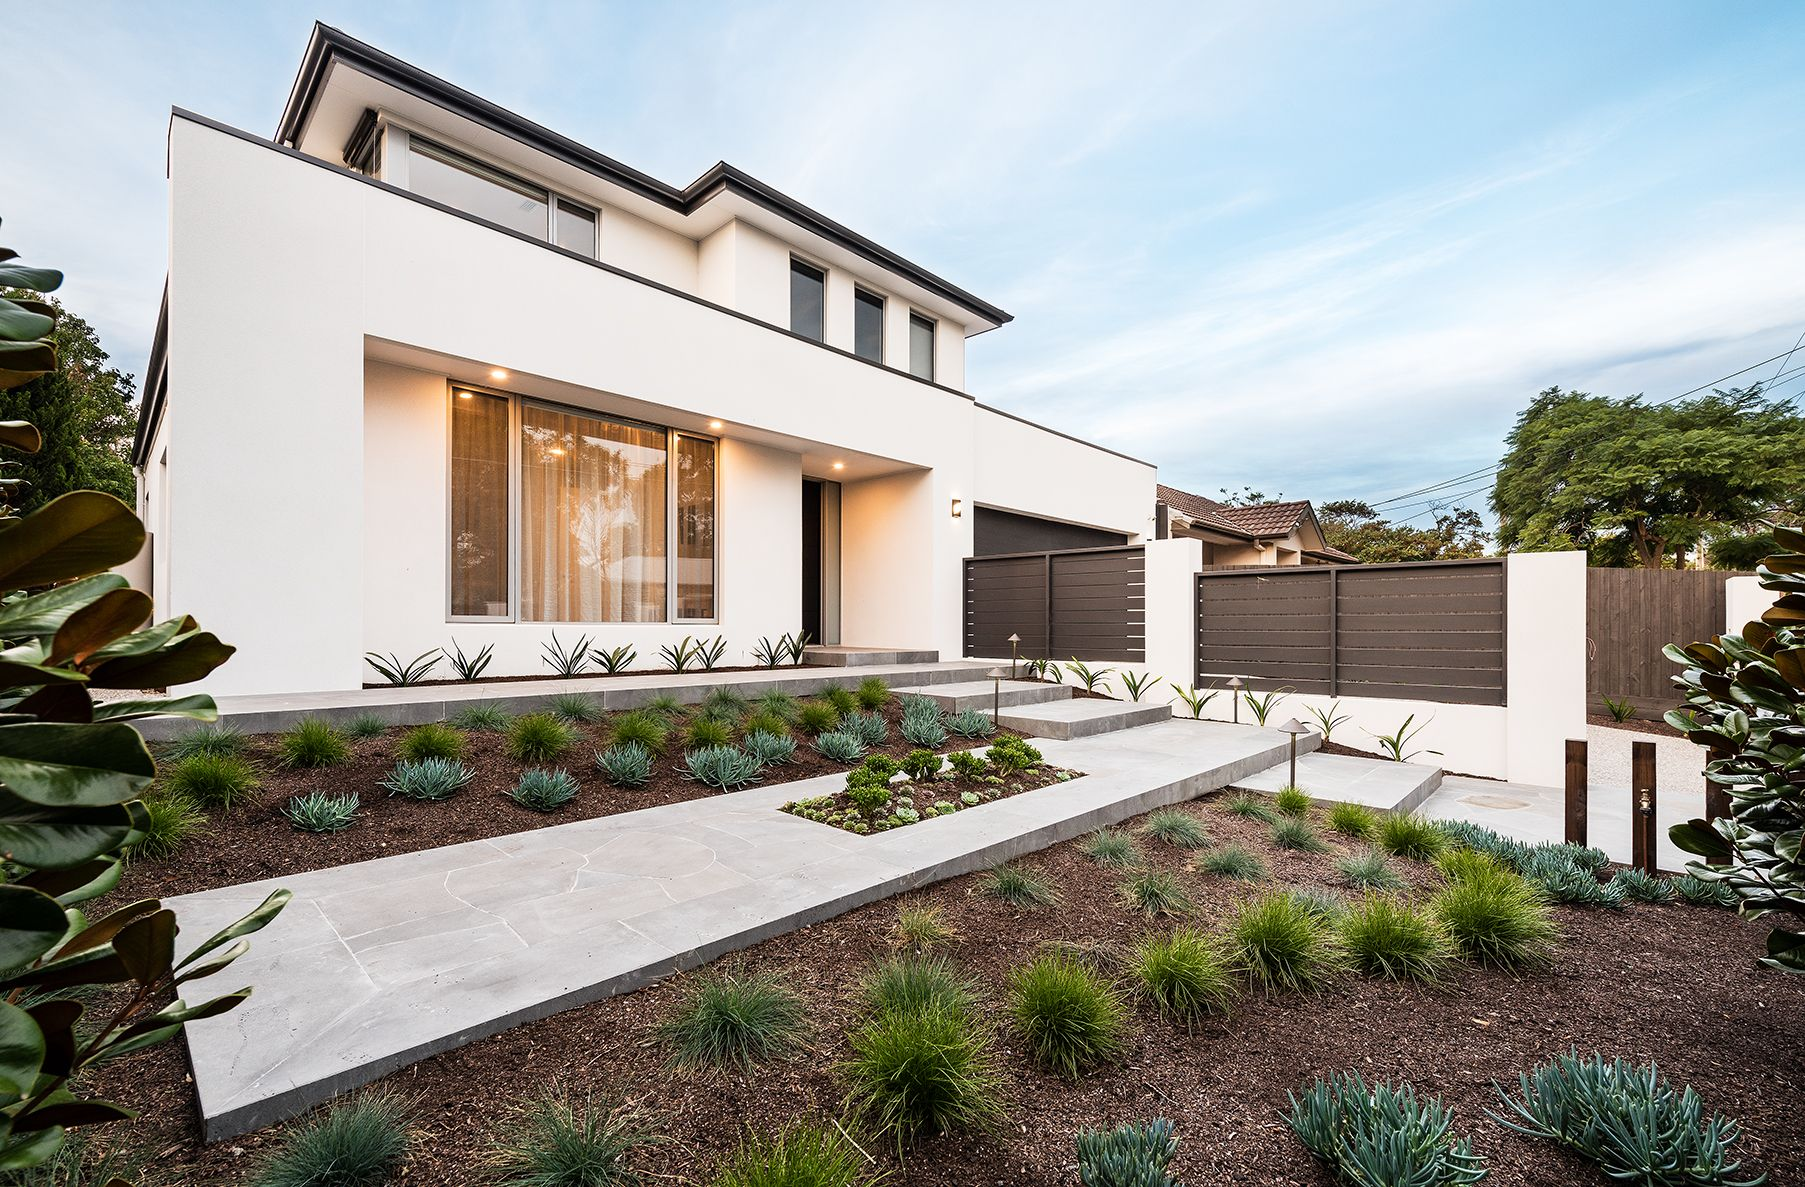 Pin By Bayon Gardens On Bayside Dreams Landscape Design Melbourne Landscape Design House Styles